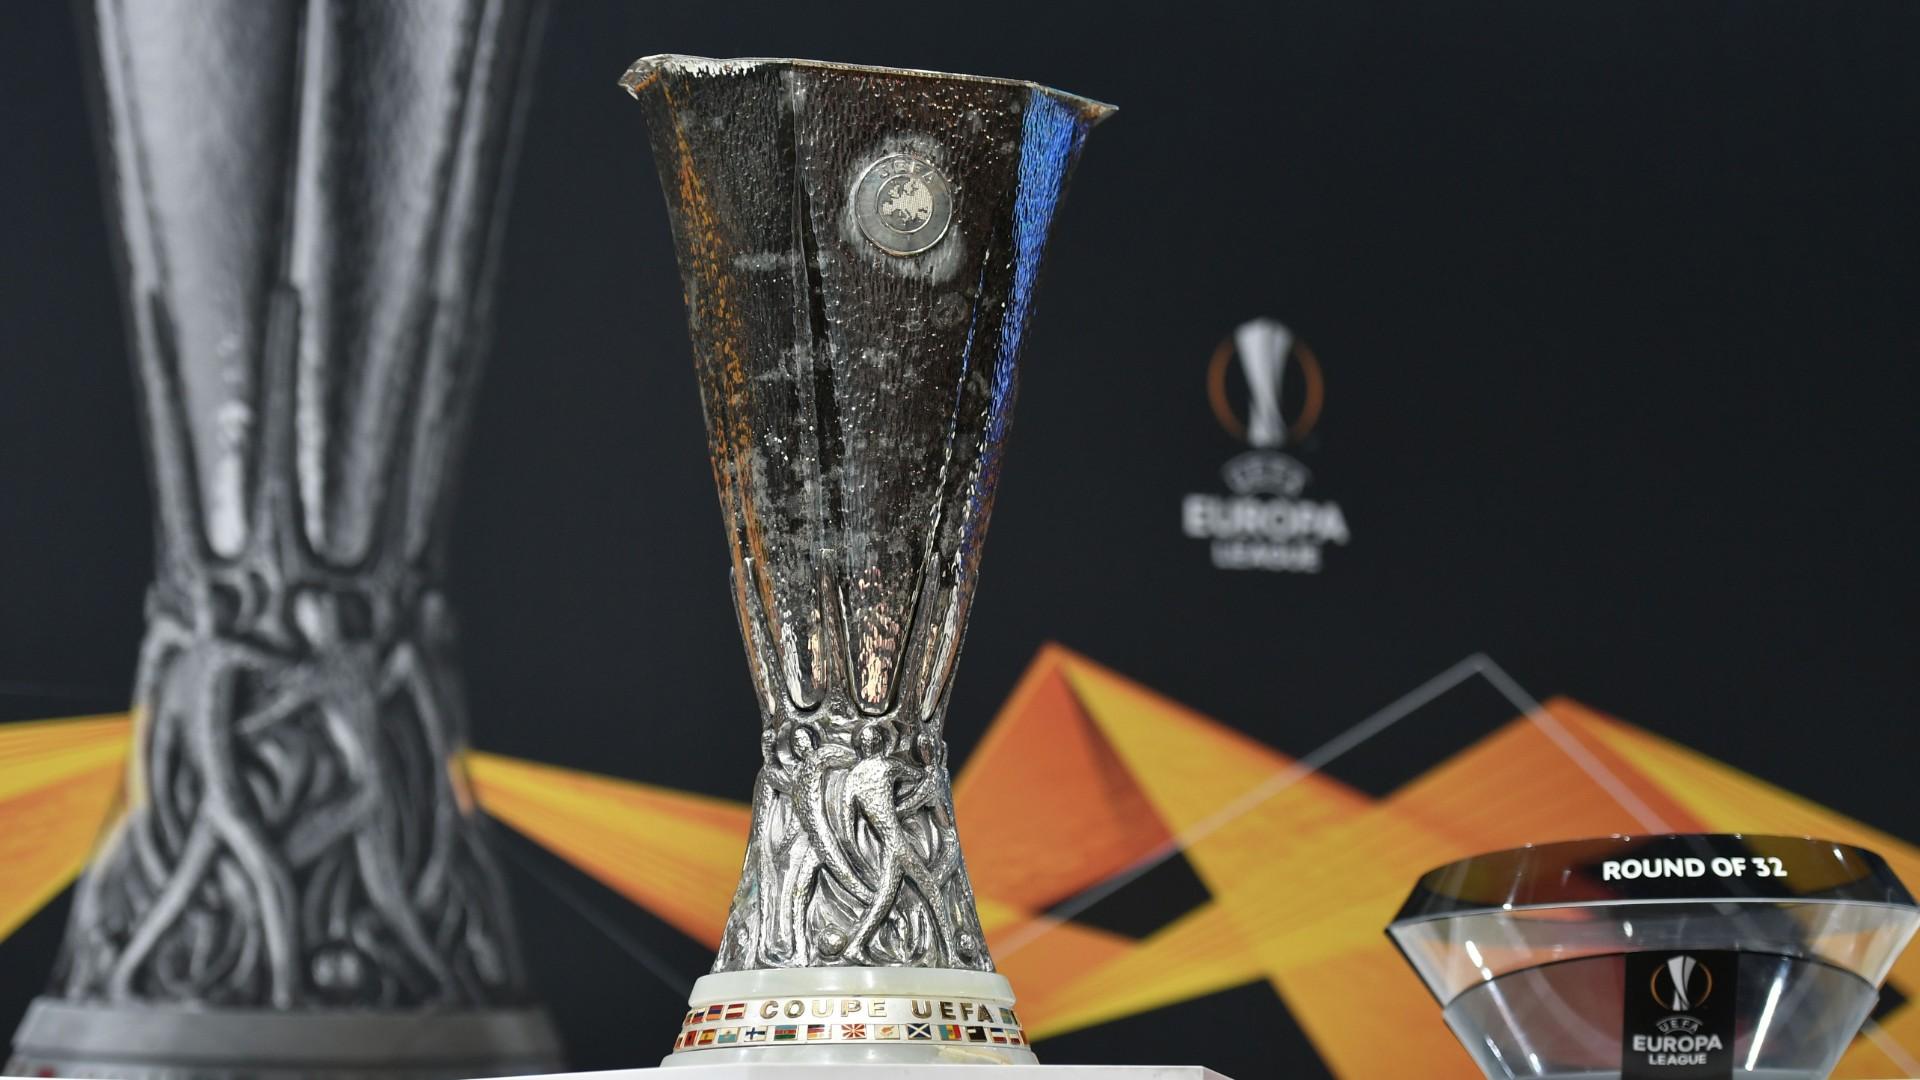 europa-league-draw_11kw8uop4ovp1ee5zsp1puugz